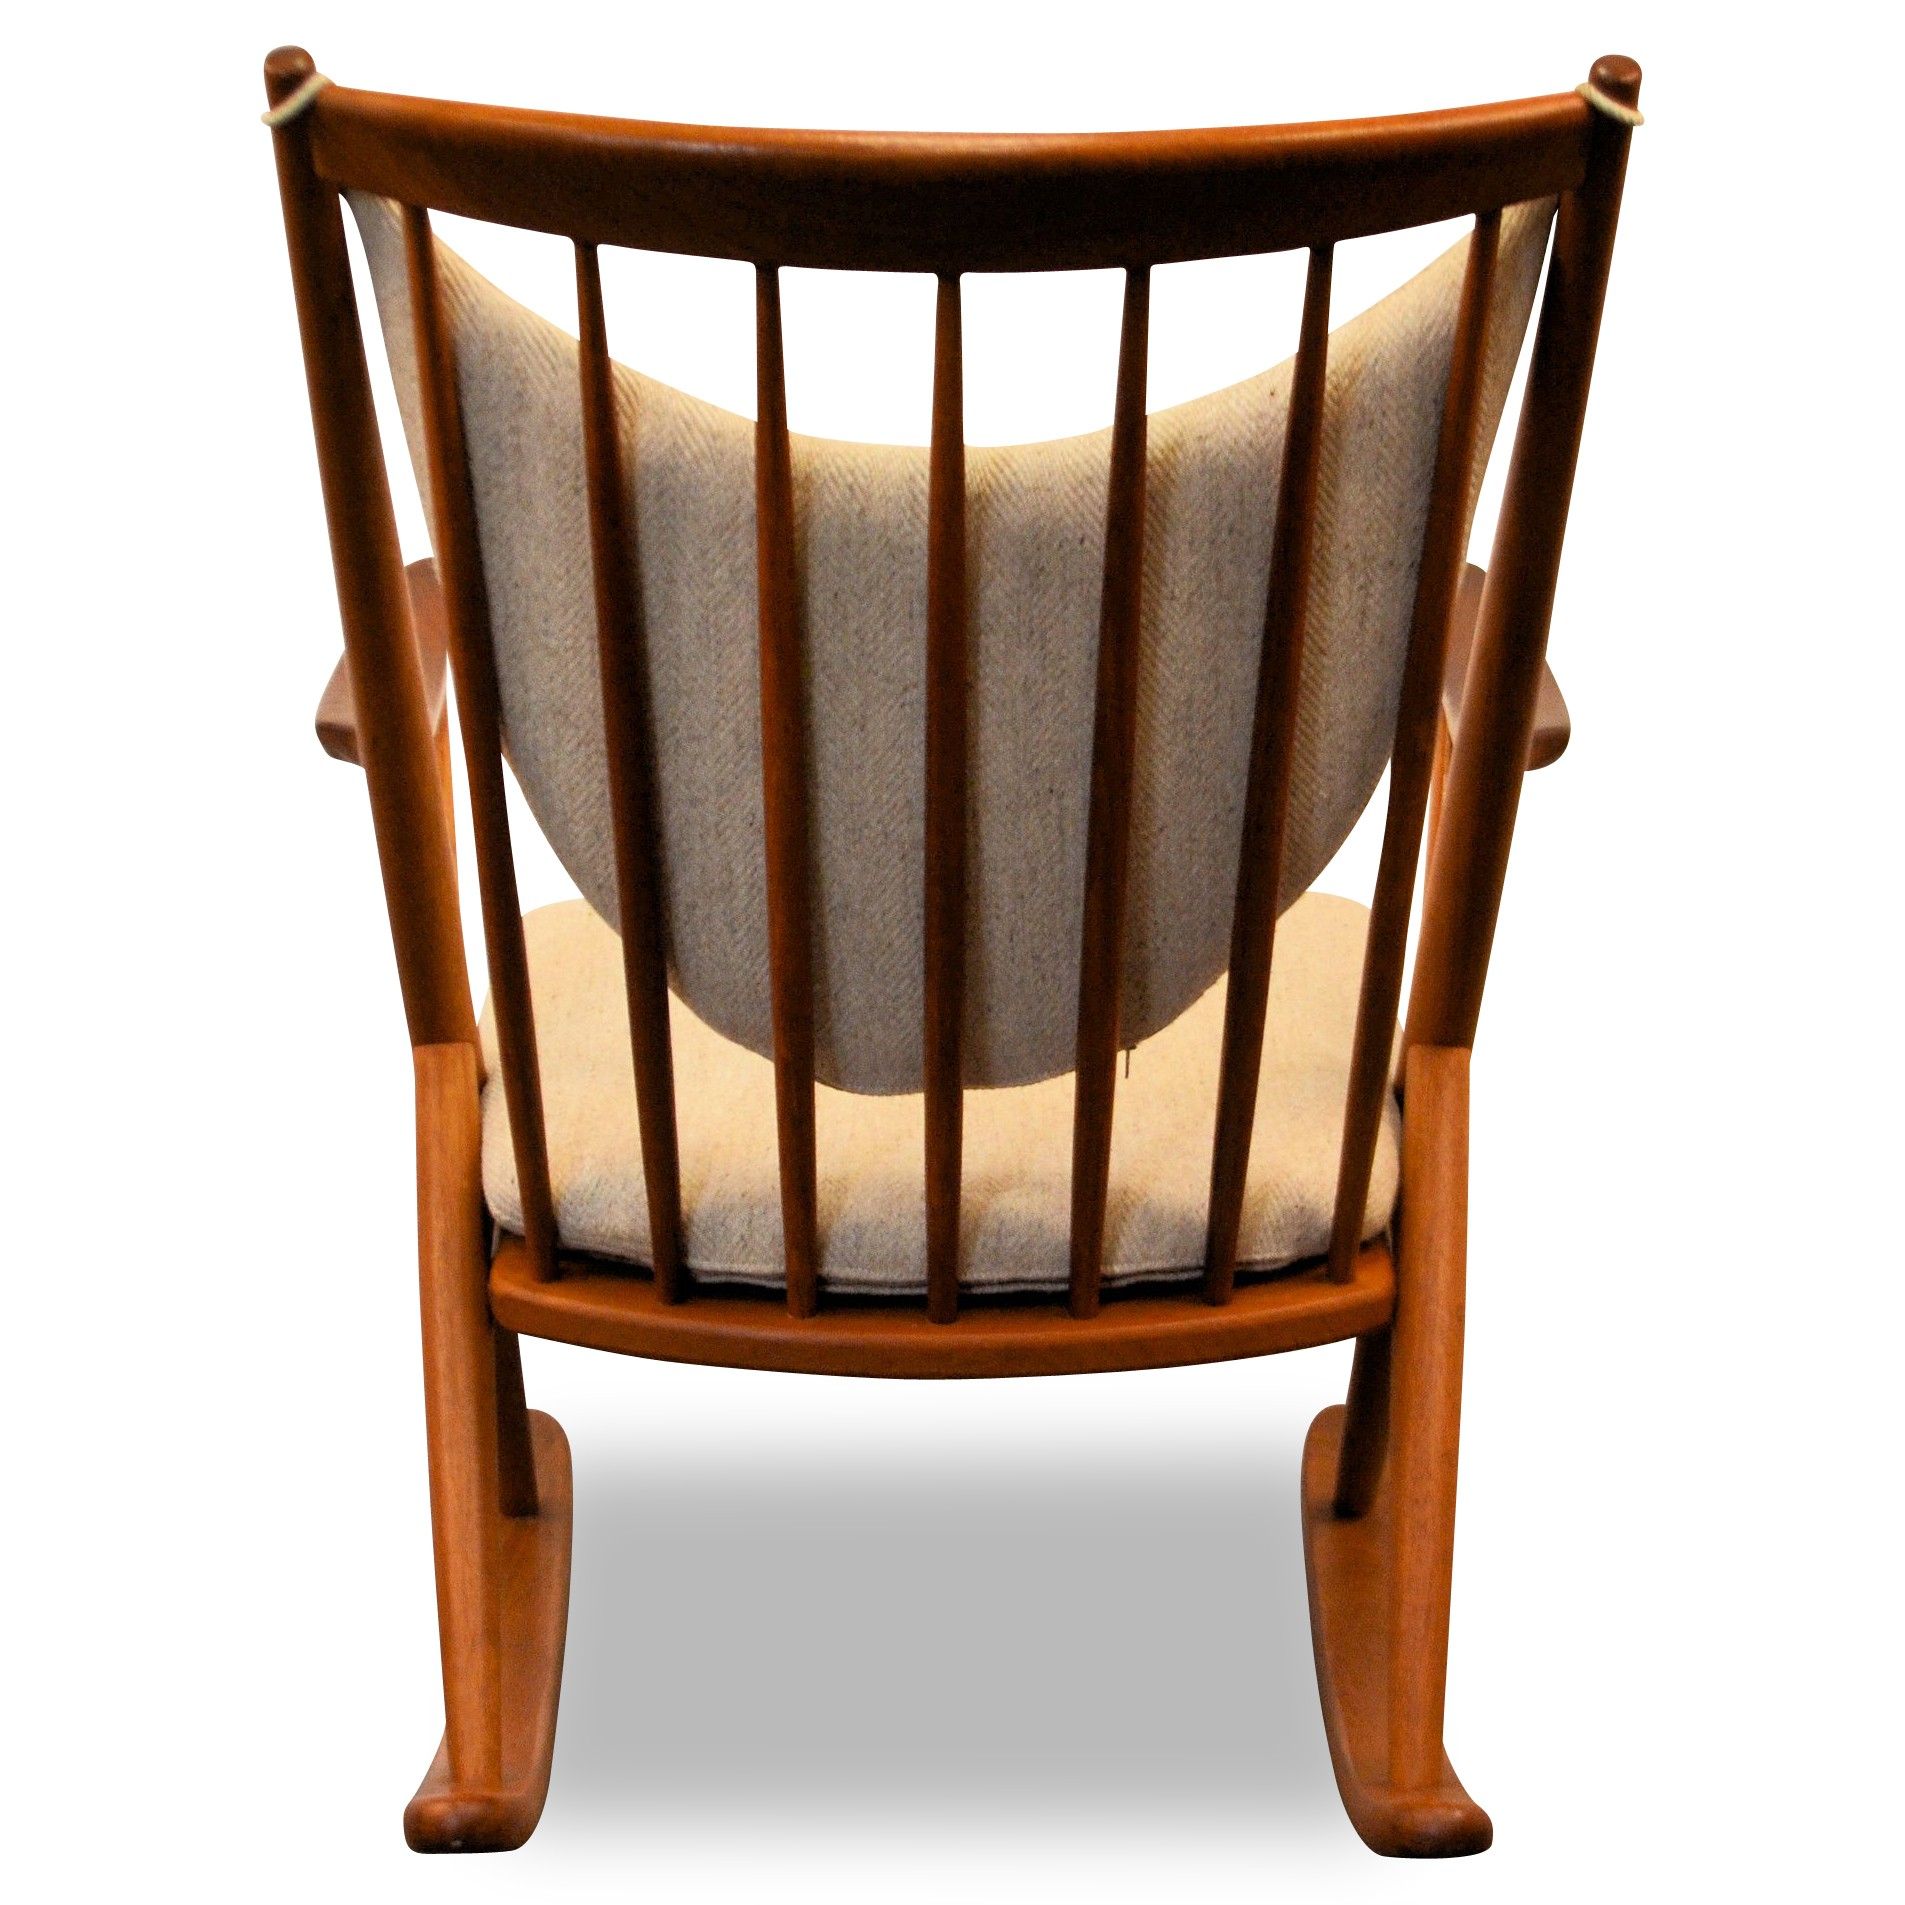 Frank reenskaug rocking chair - Danish Bramin Rocking Chair In Oak And Teak Frank Reenskaug 1950s Previous Next